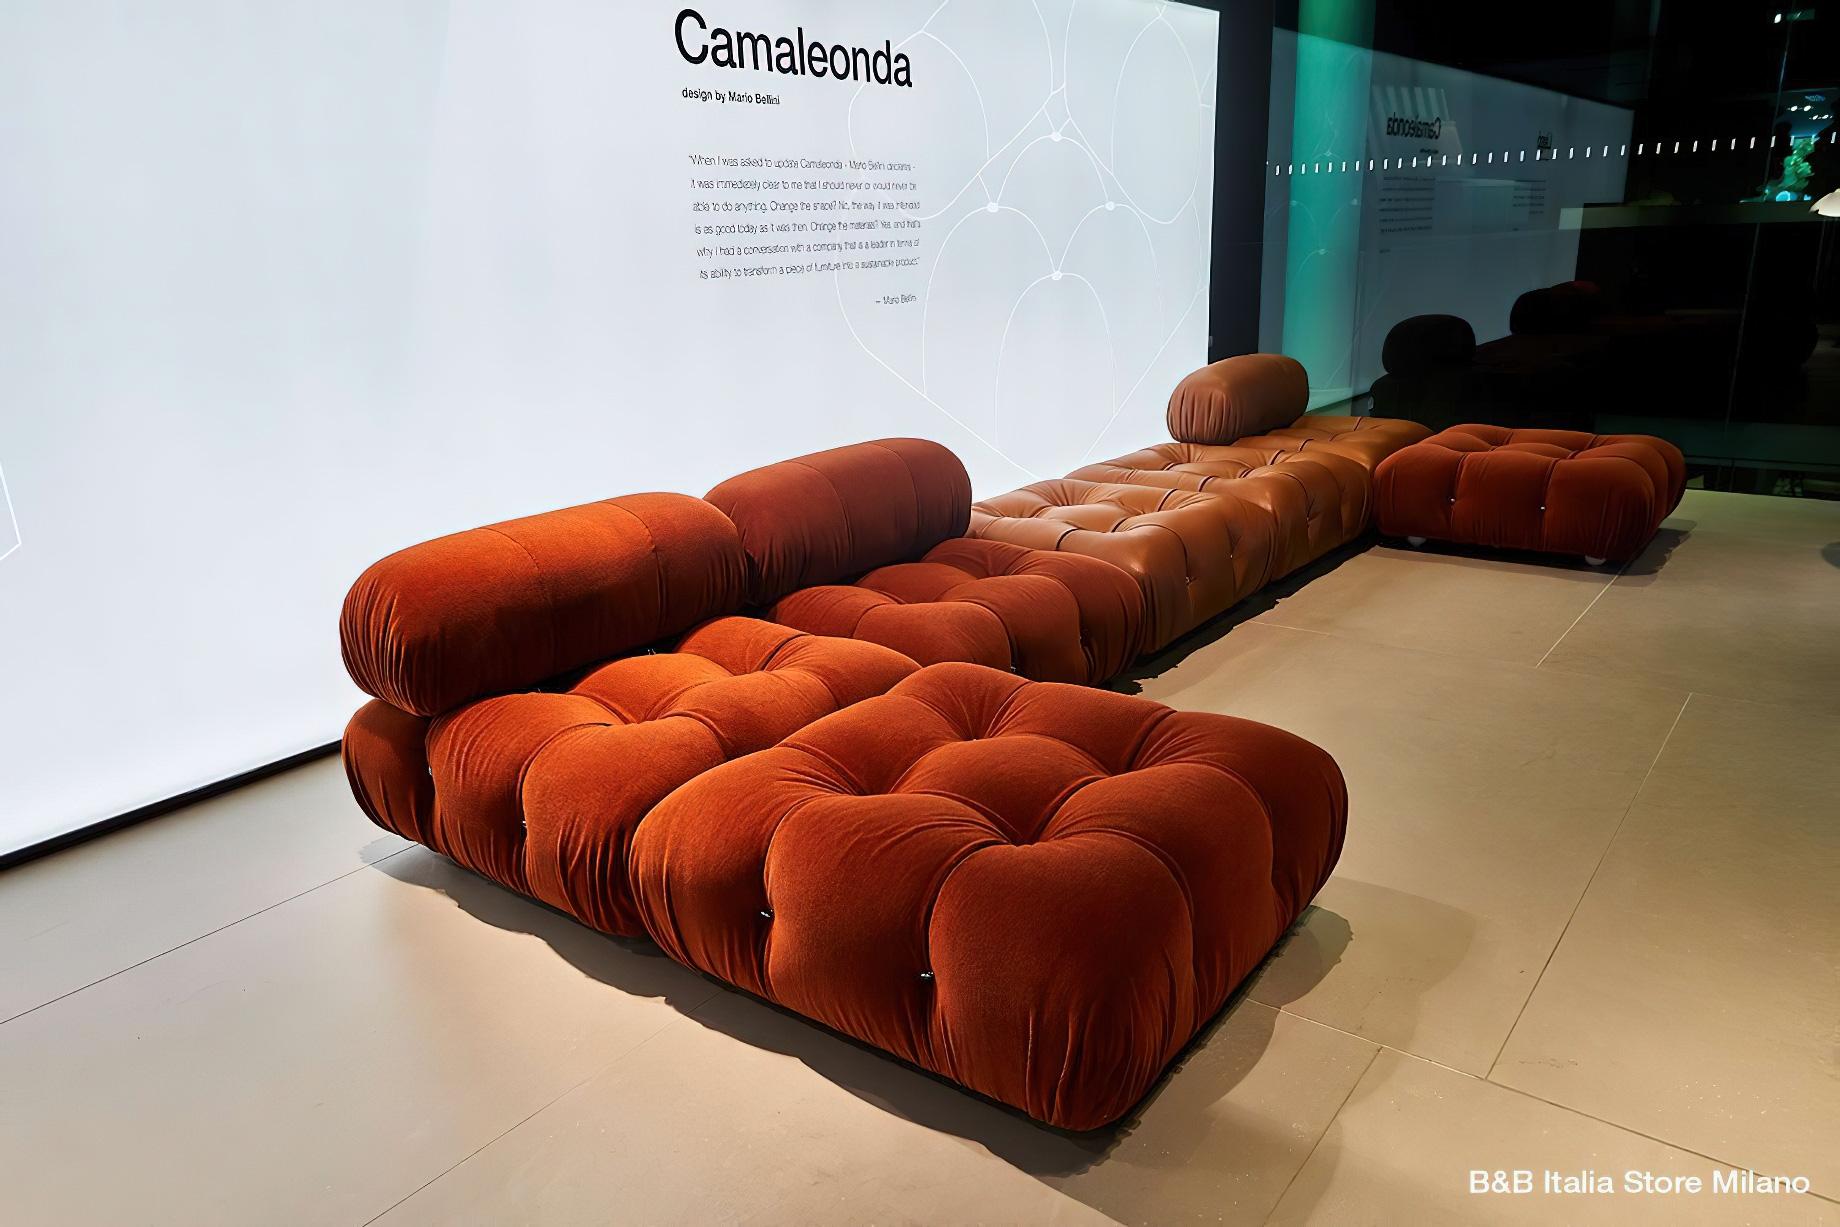 Camaleonda Classic Sofa Collection B&B Italia – Mario Bellini – B&B Italia Store Milano